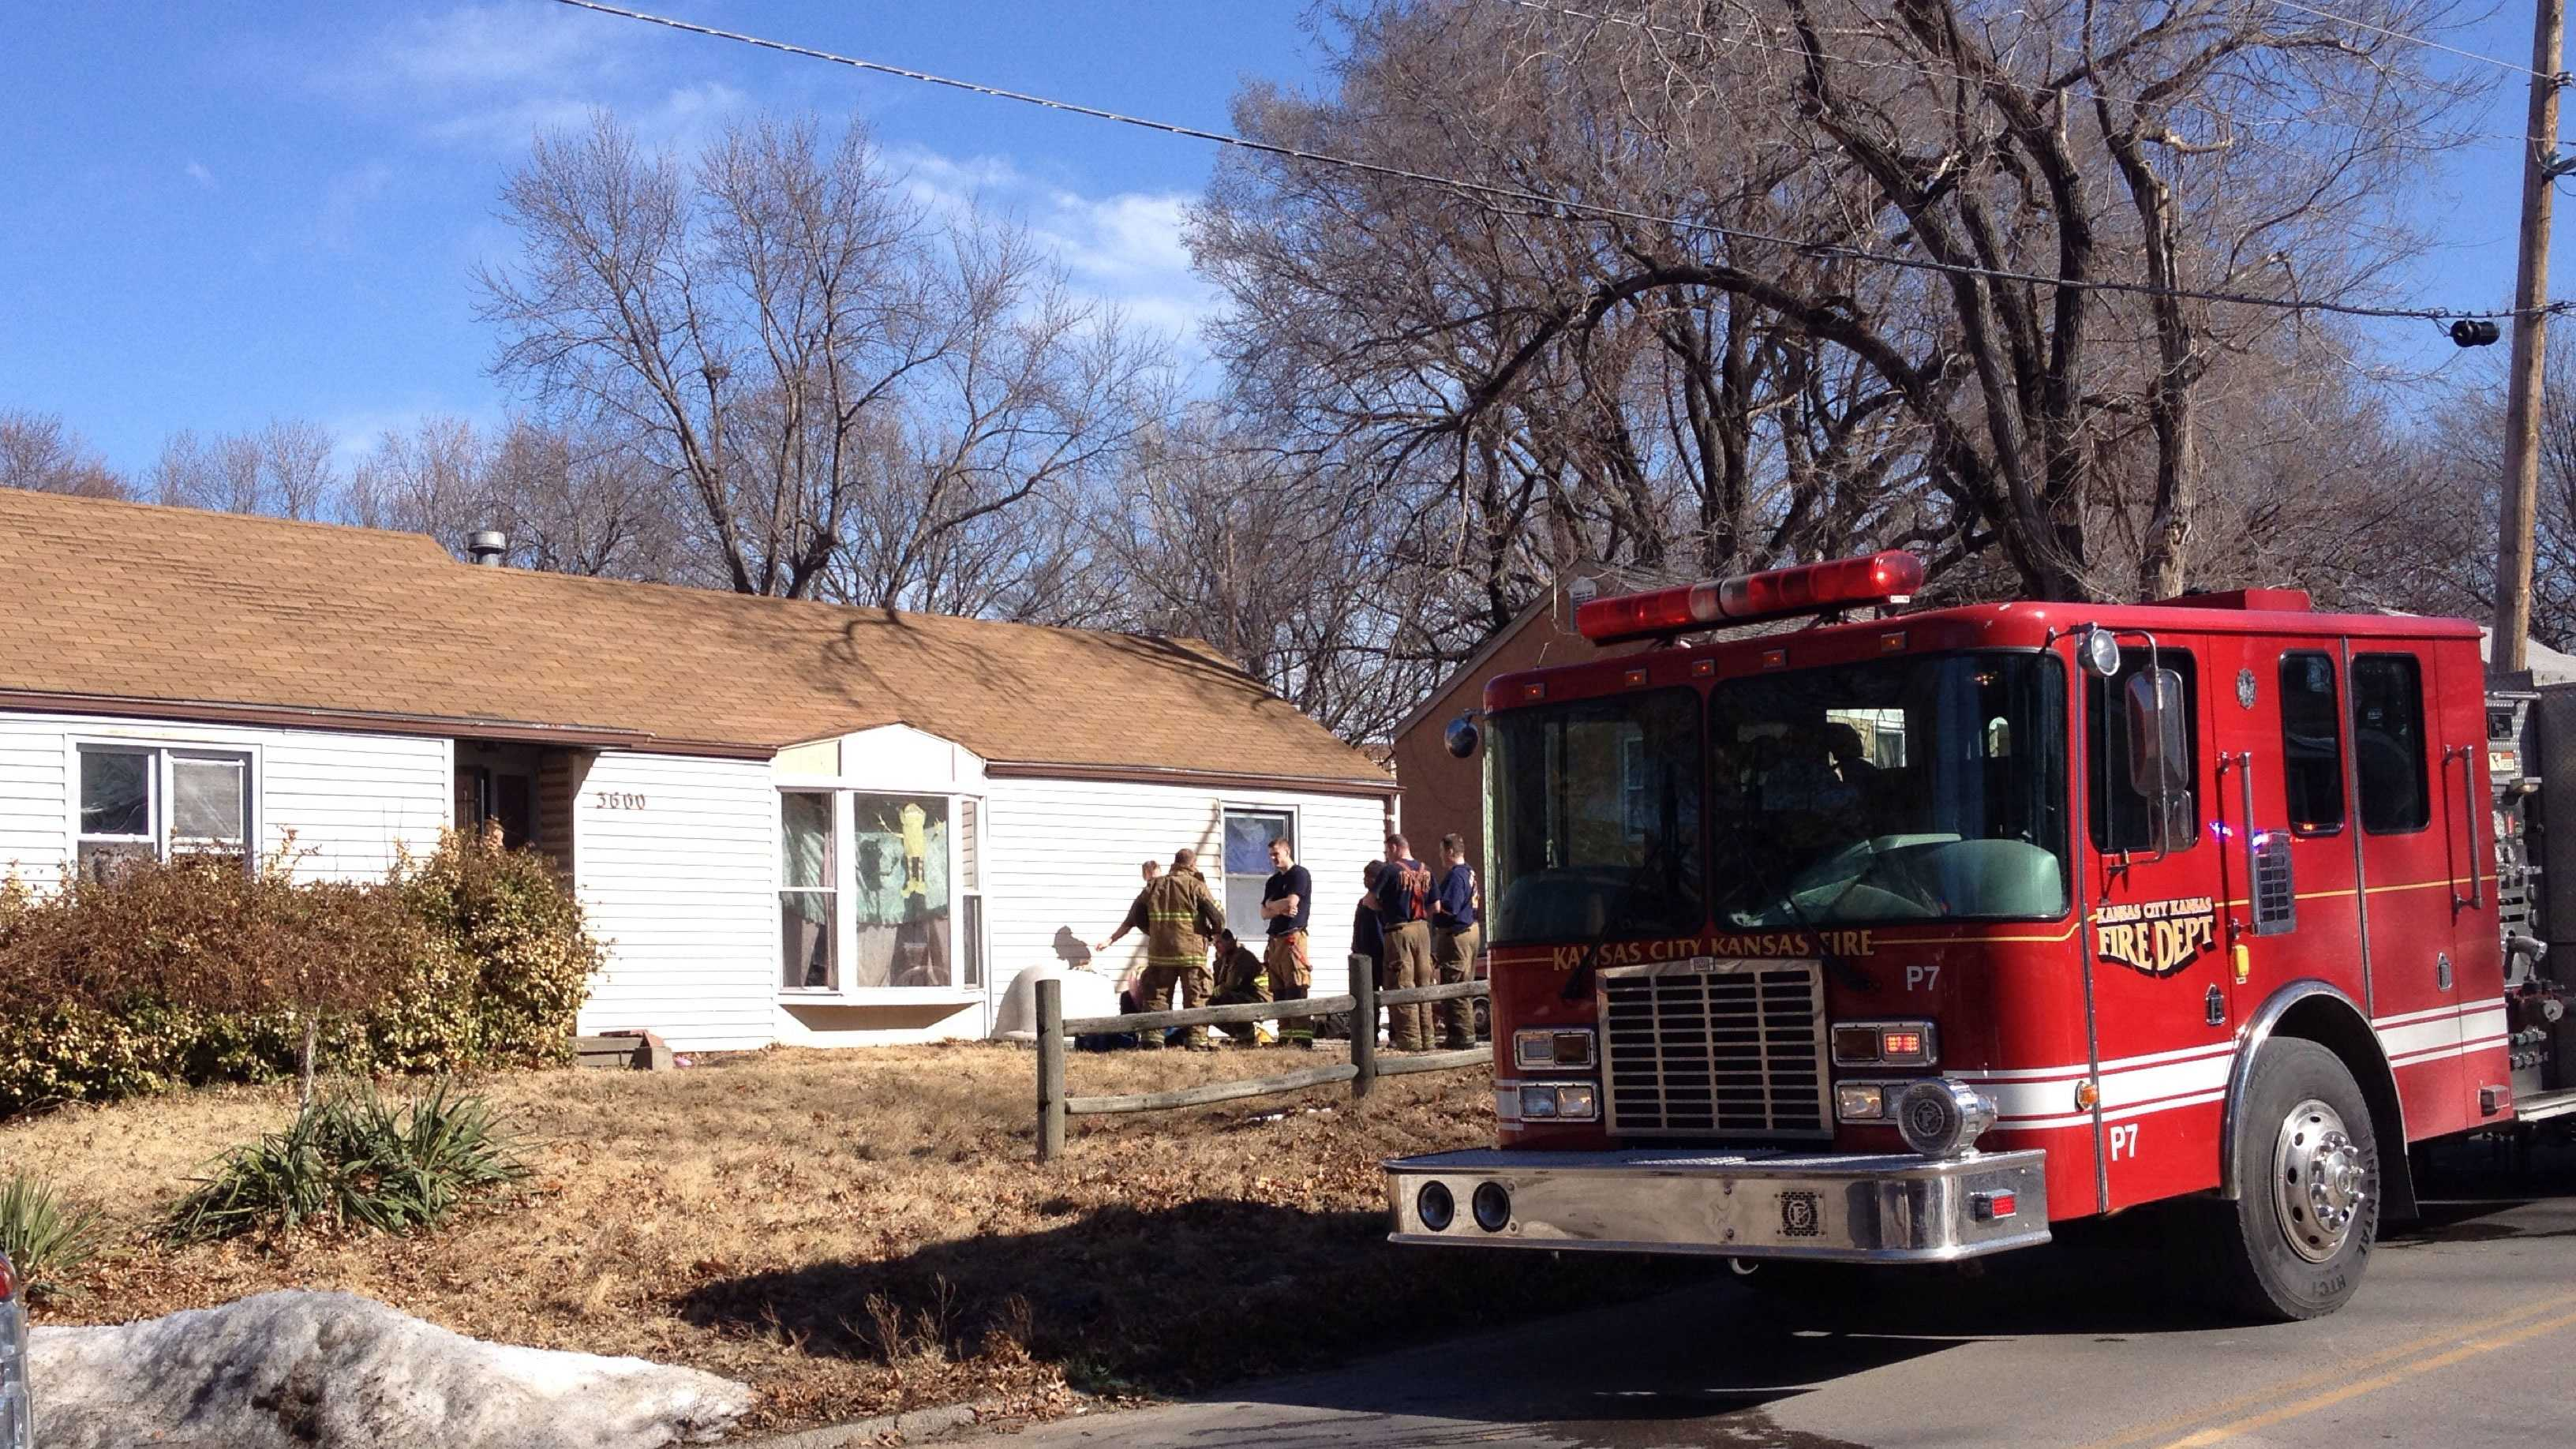 House fire, 3600 Shawnee Drive